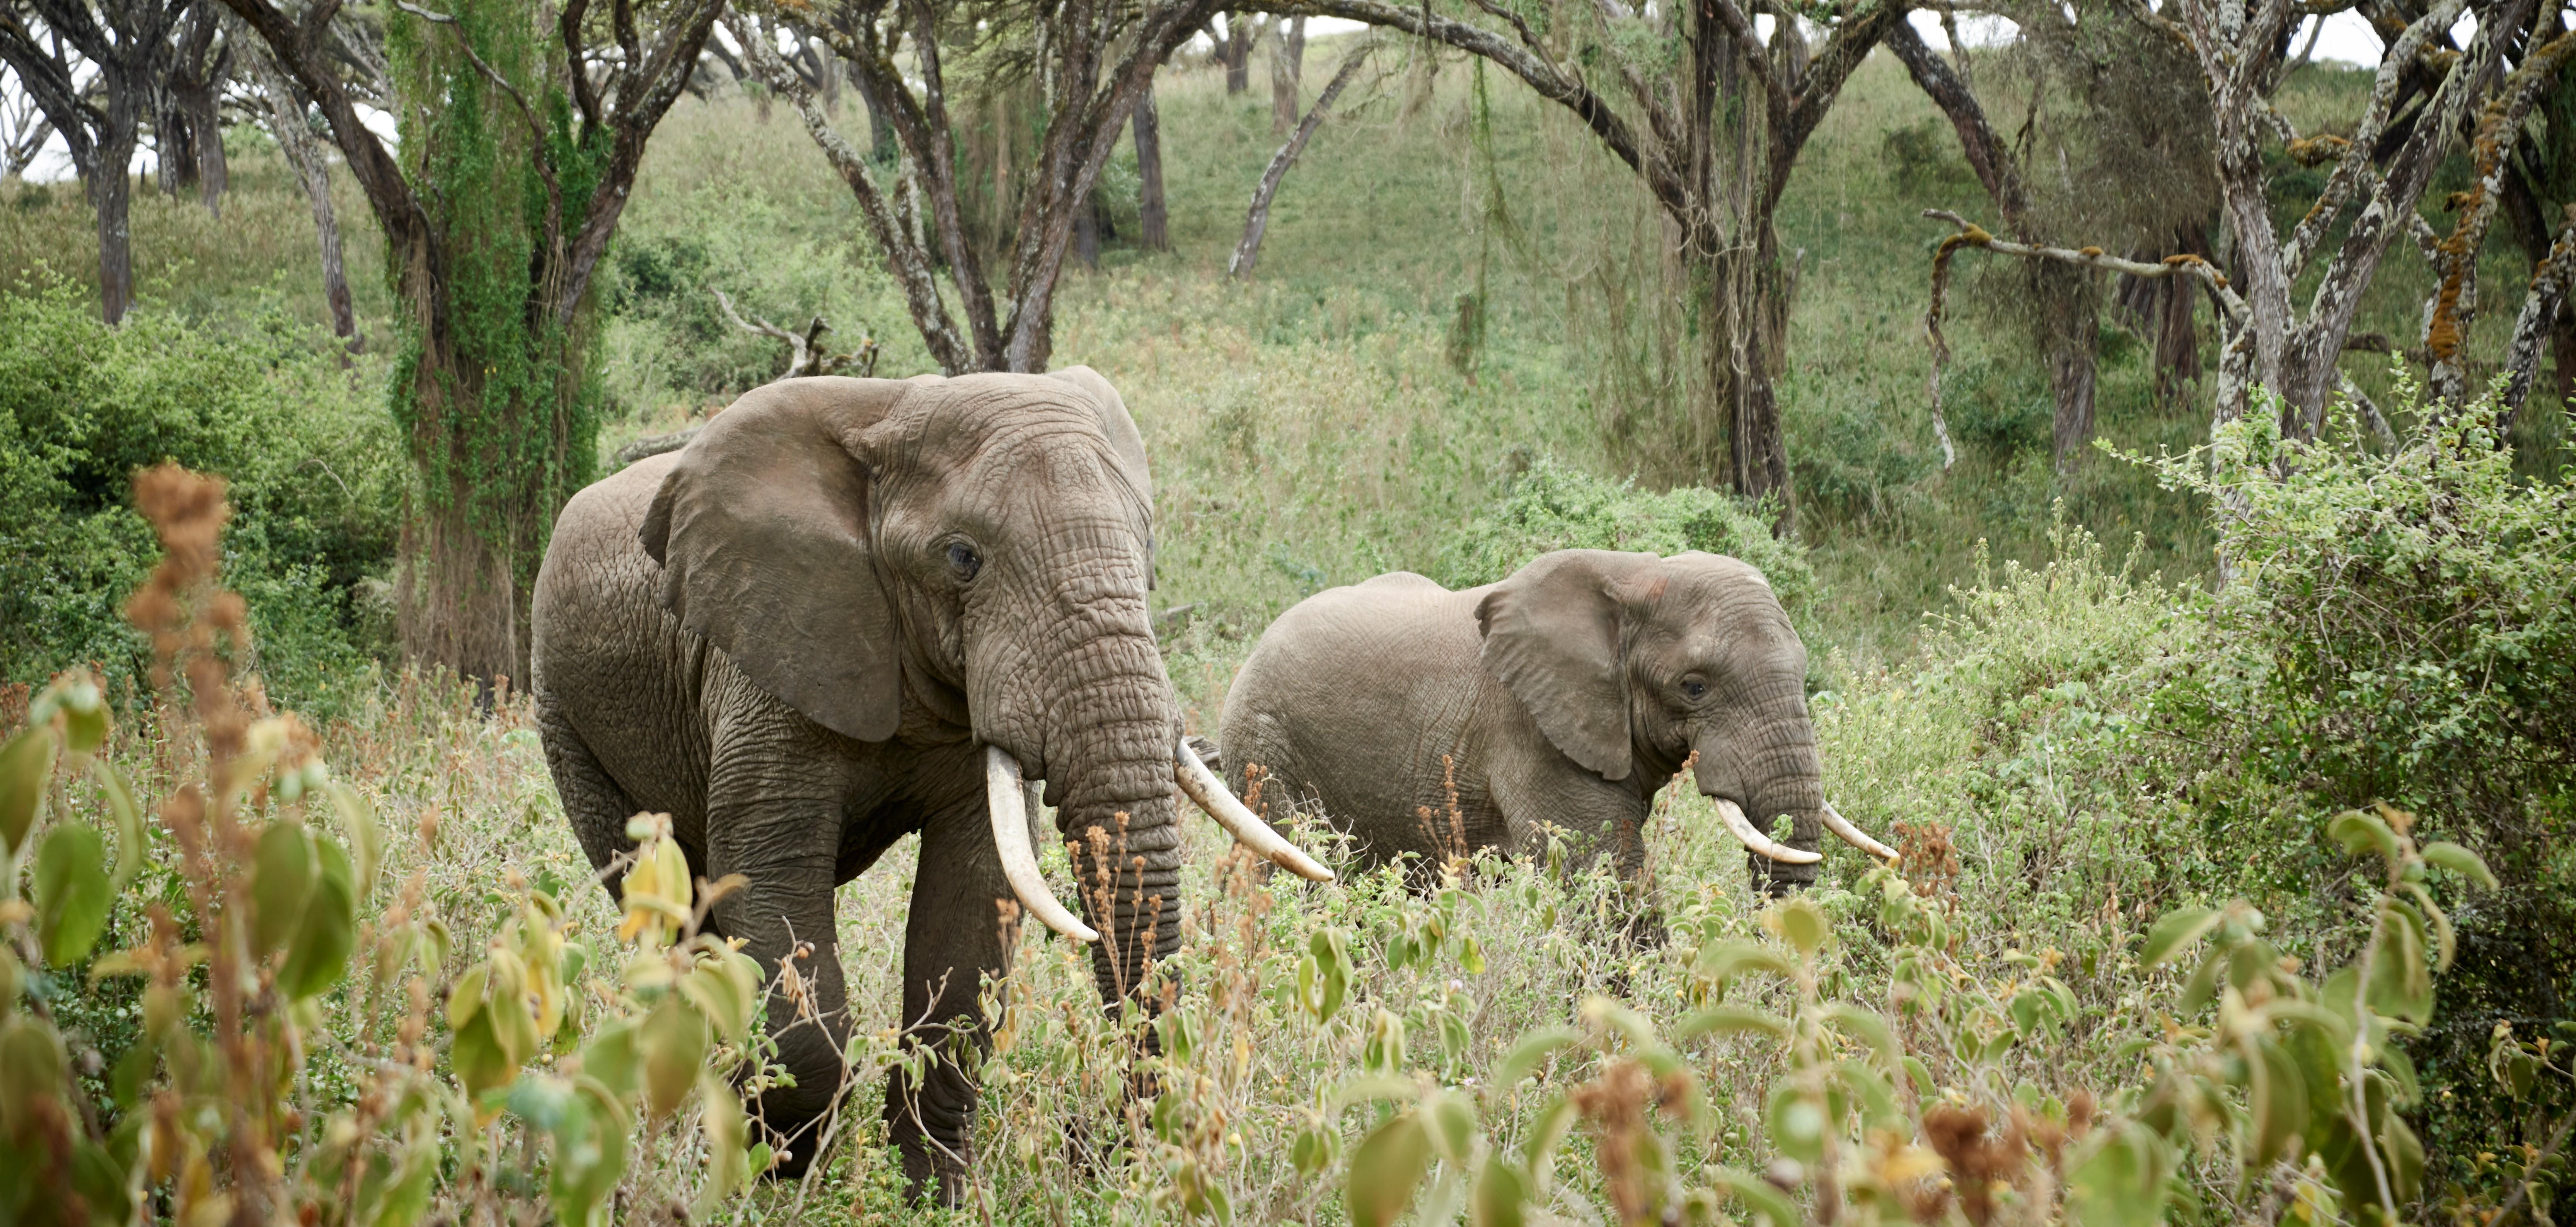 elephants-ngorongoro-crater-tanzania